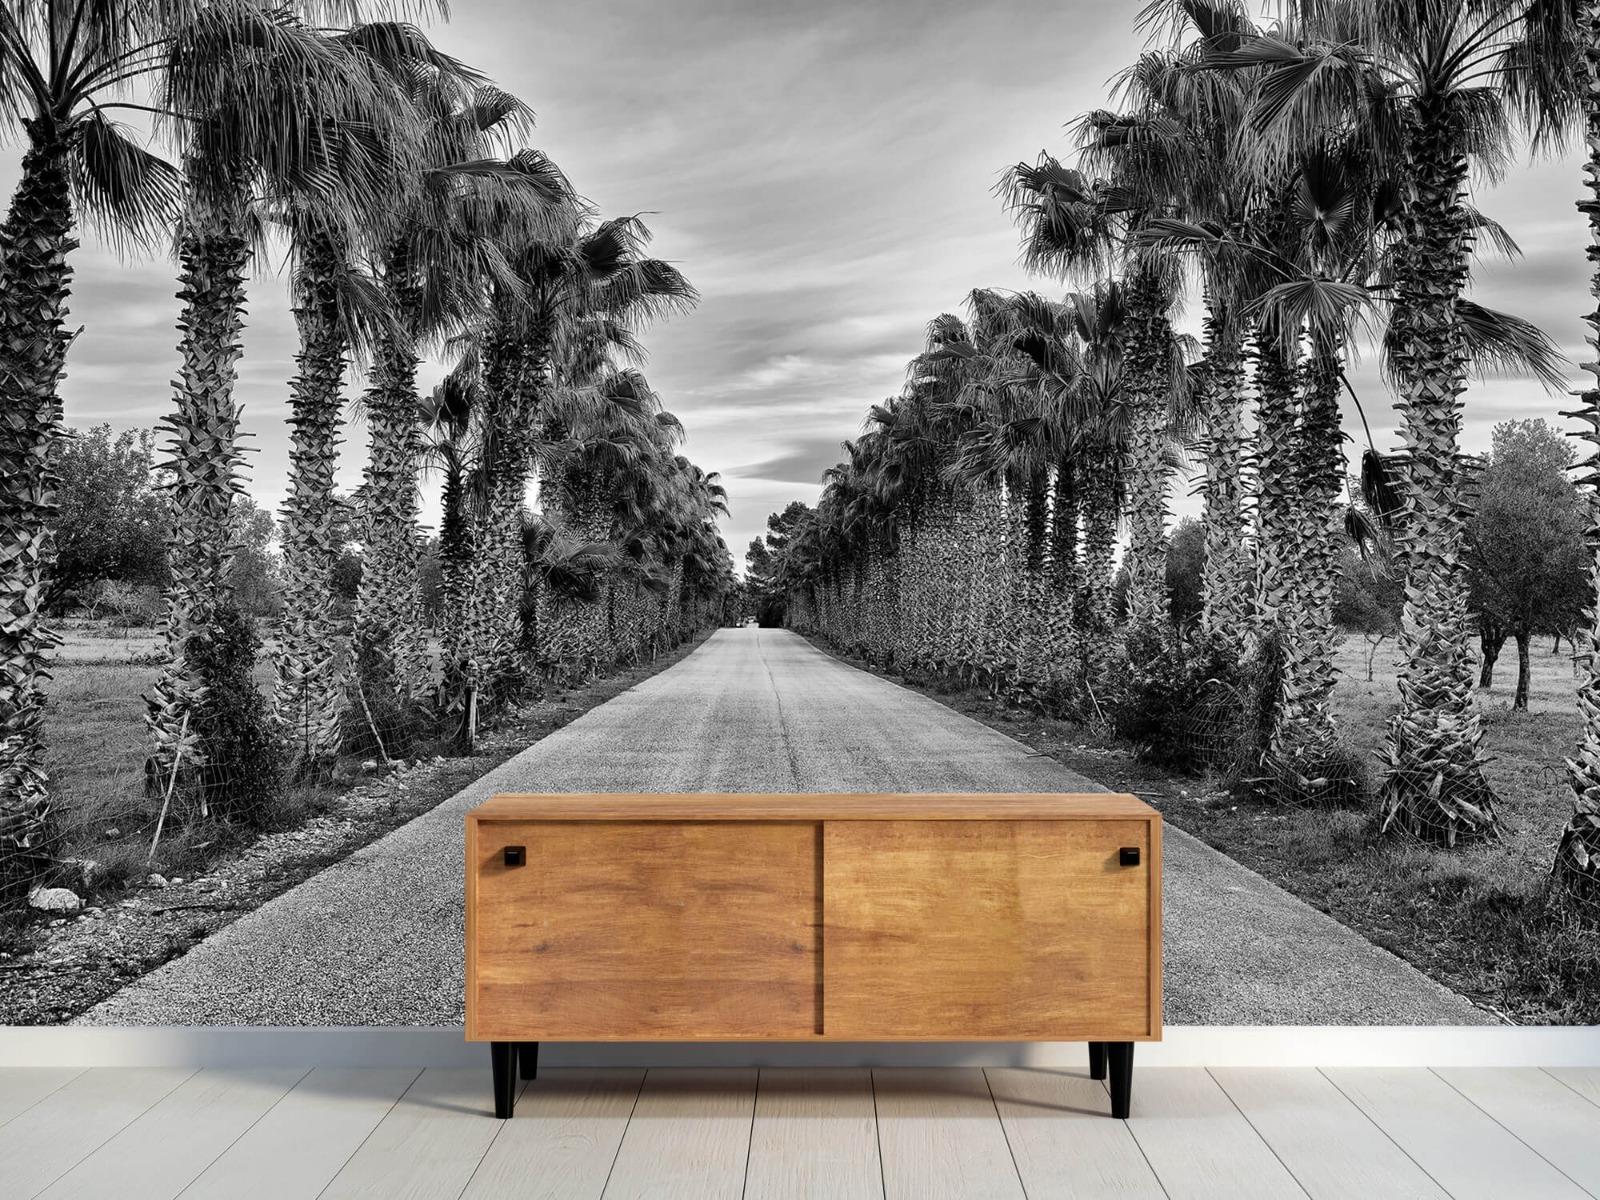 Palmbomen - Straat met palmbomen - Woonkamer 9